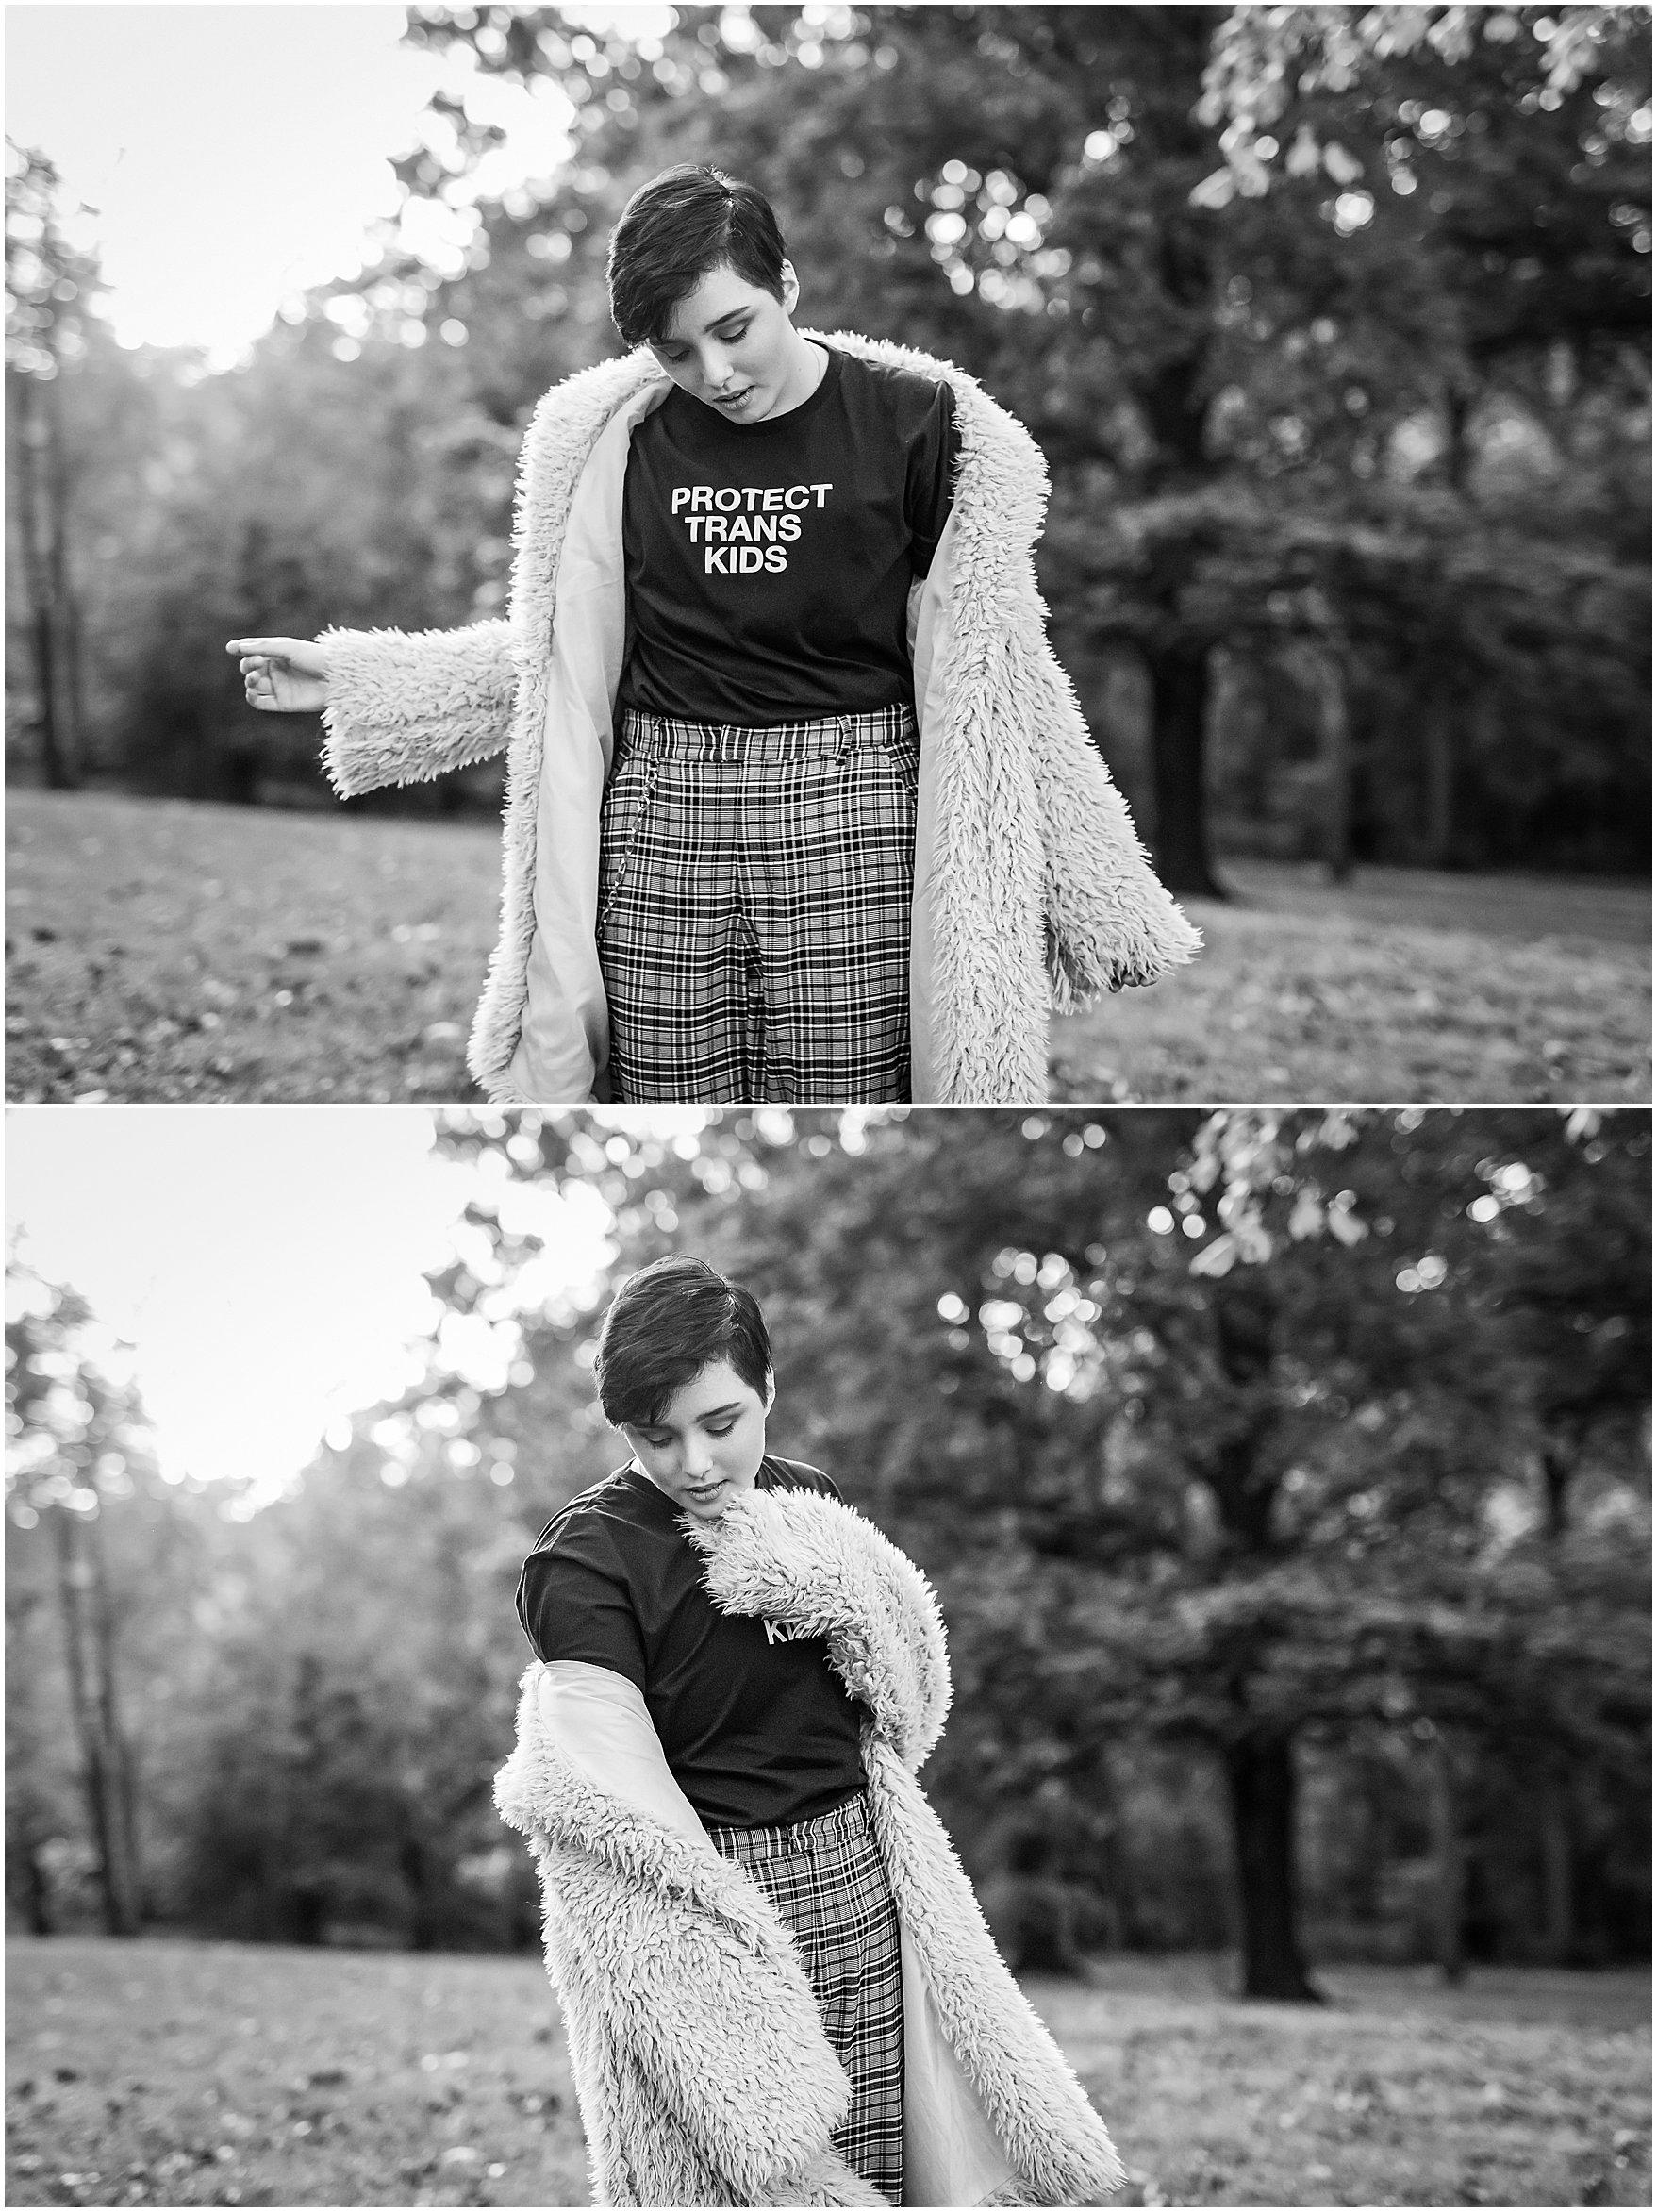 trans high school student black and white senior portrait in park